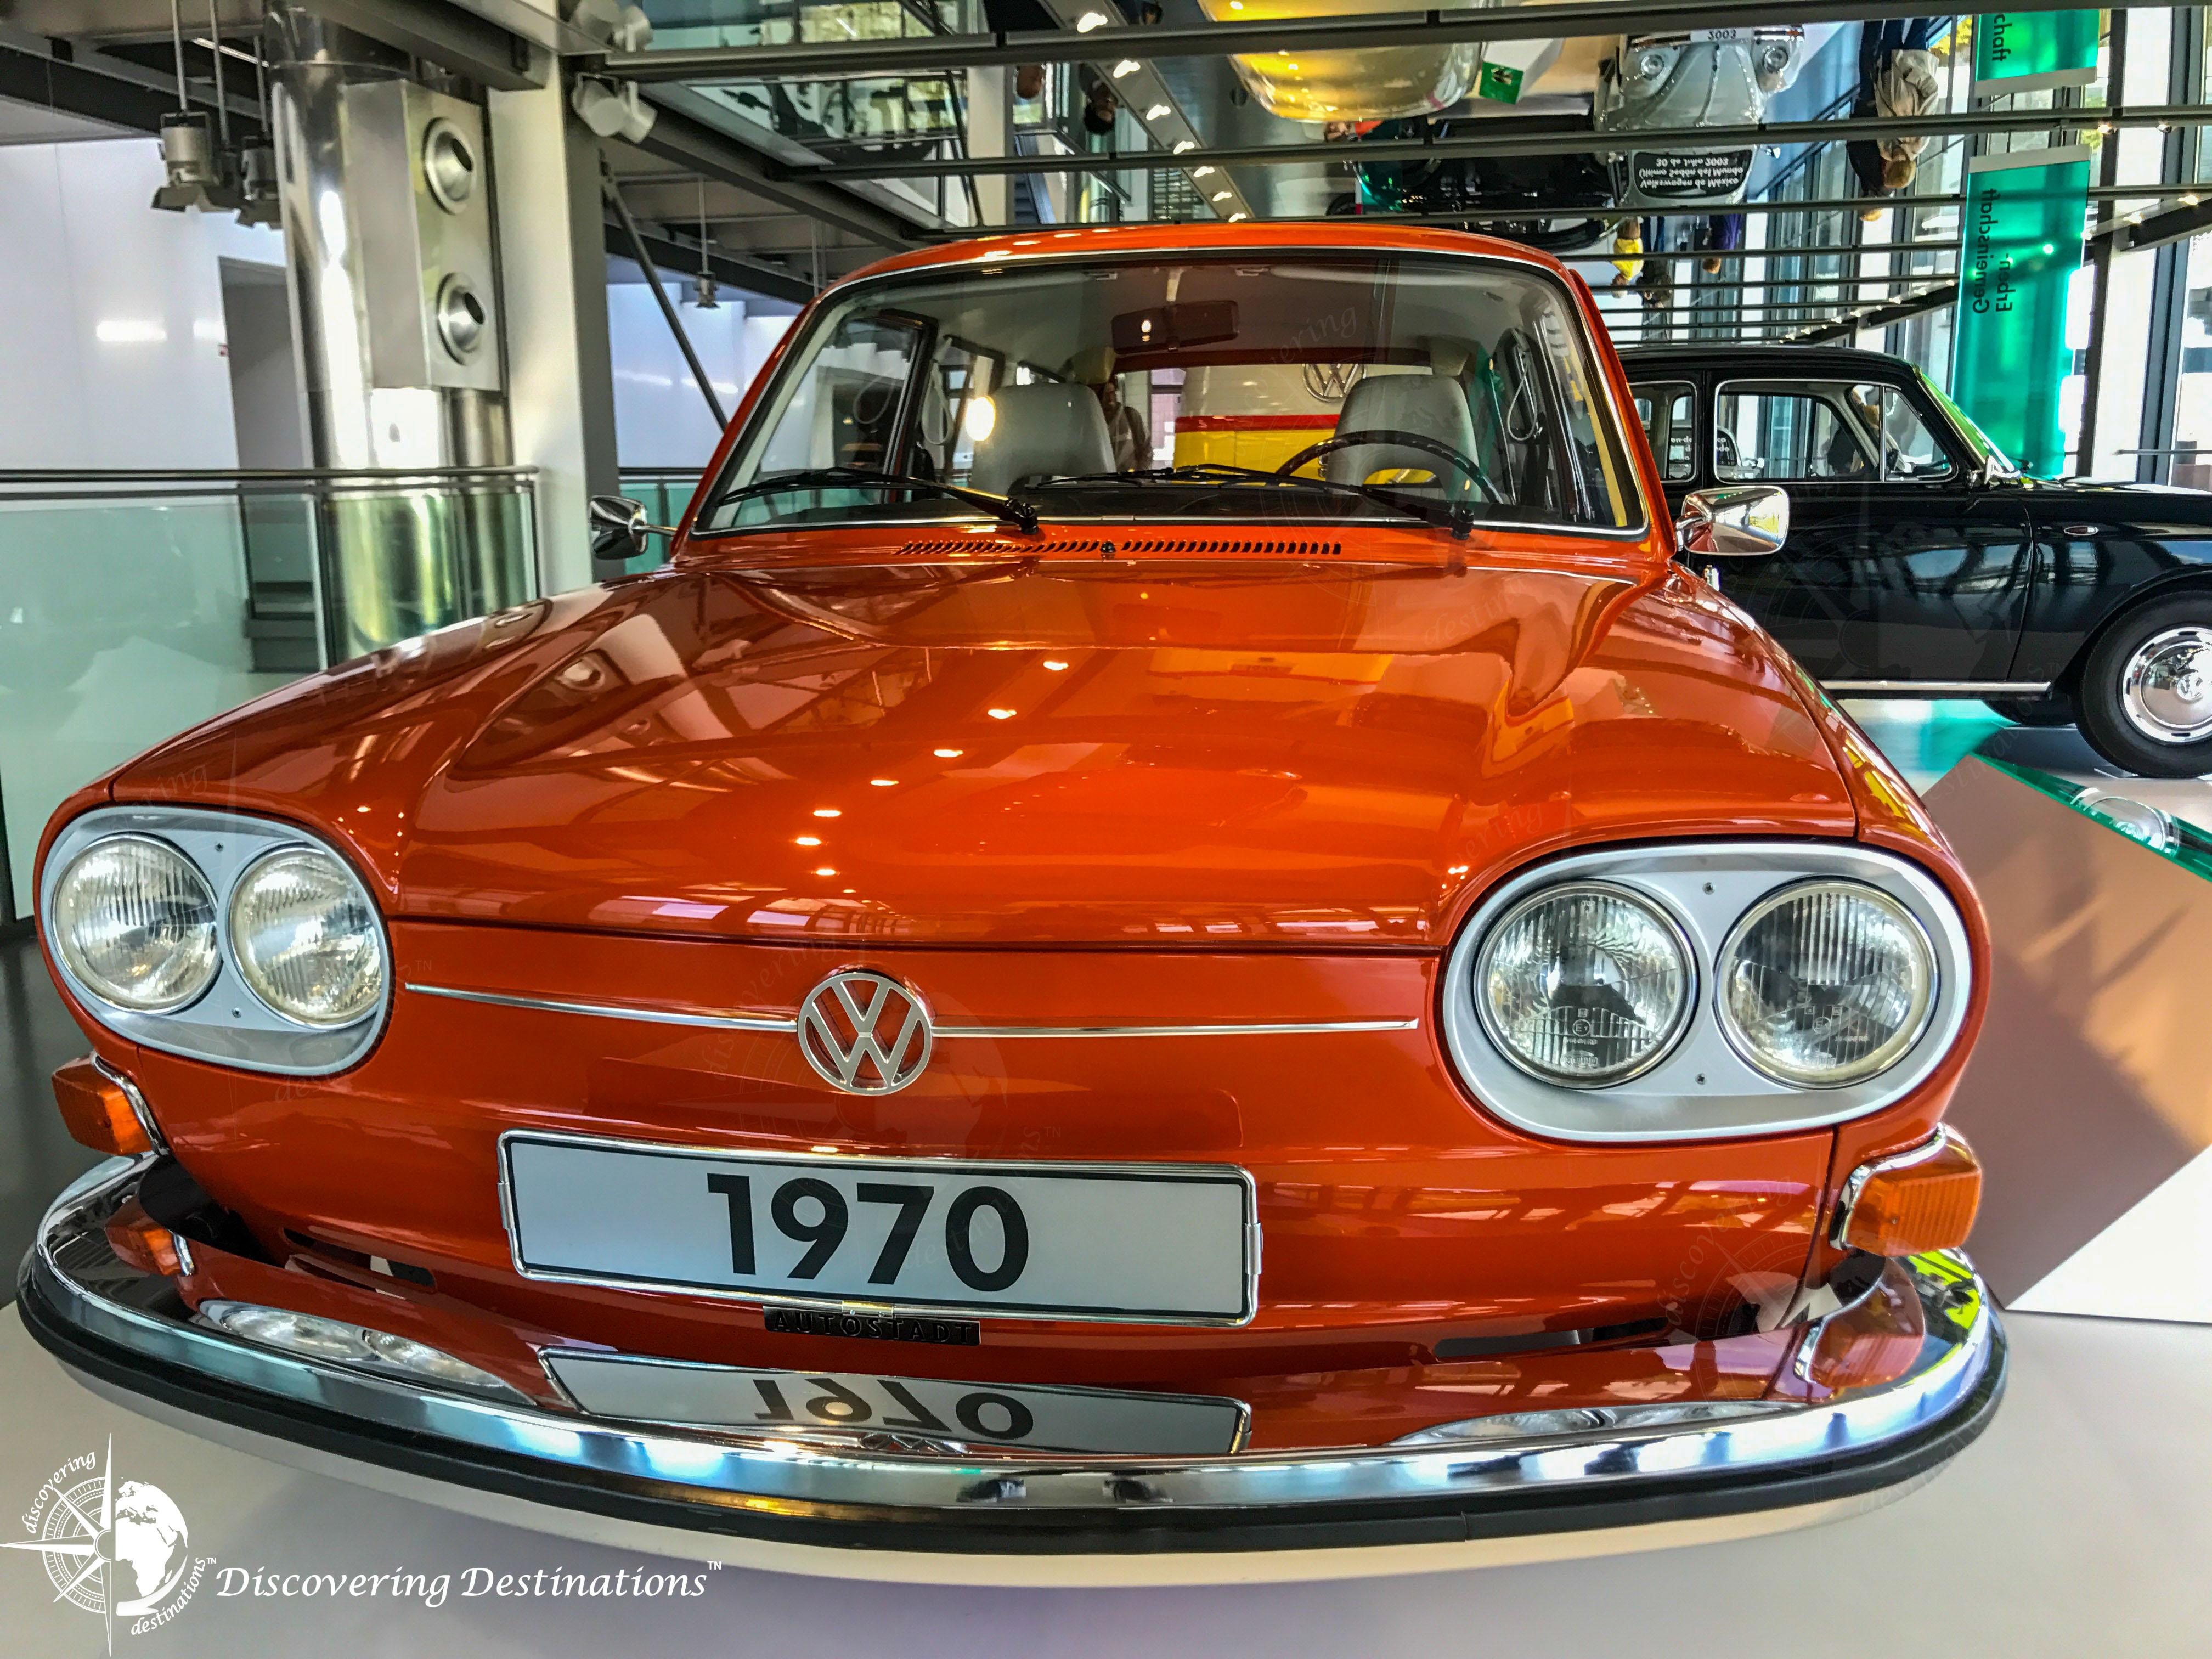 Discovering Autostadt and Volkswagen Factory, Wolfsburg